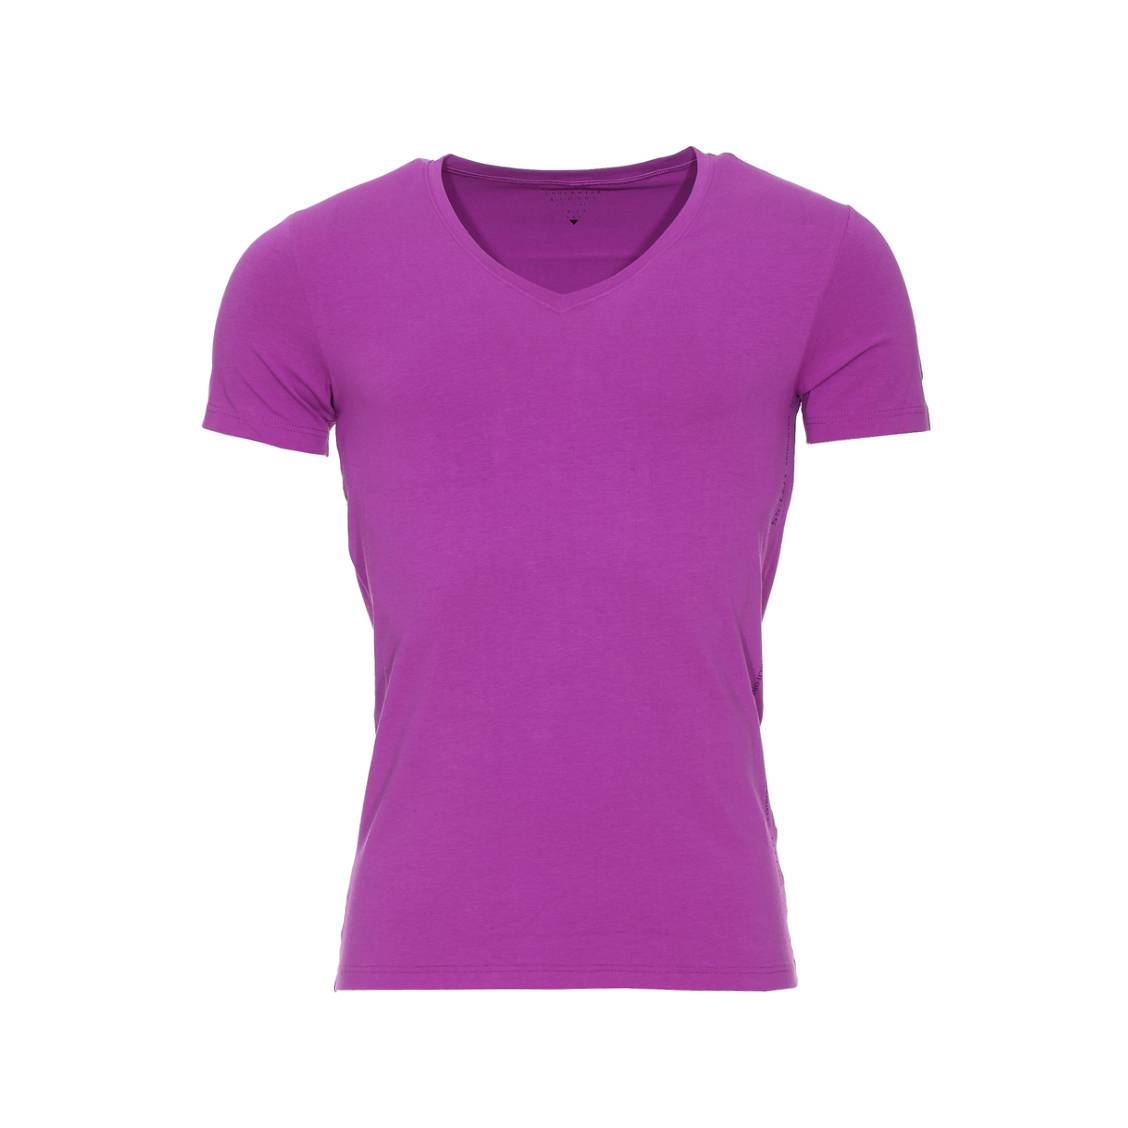 Tee-shirt col v guess en coton stretch mauve